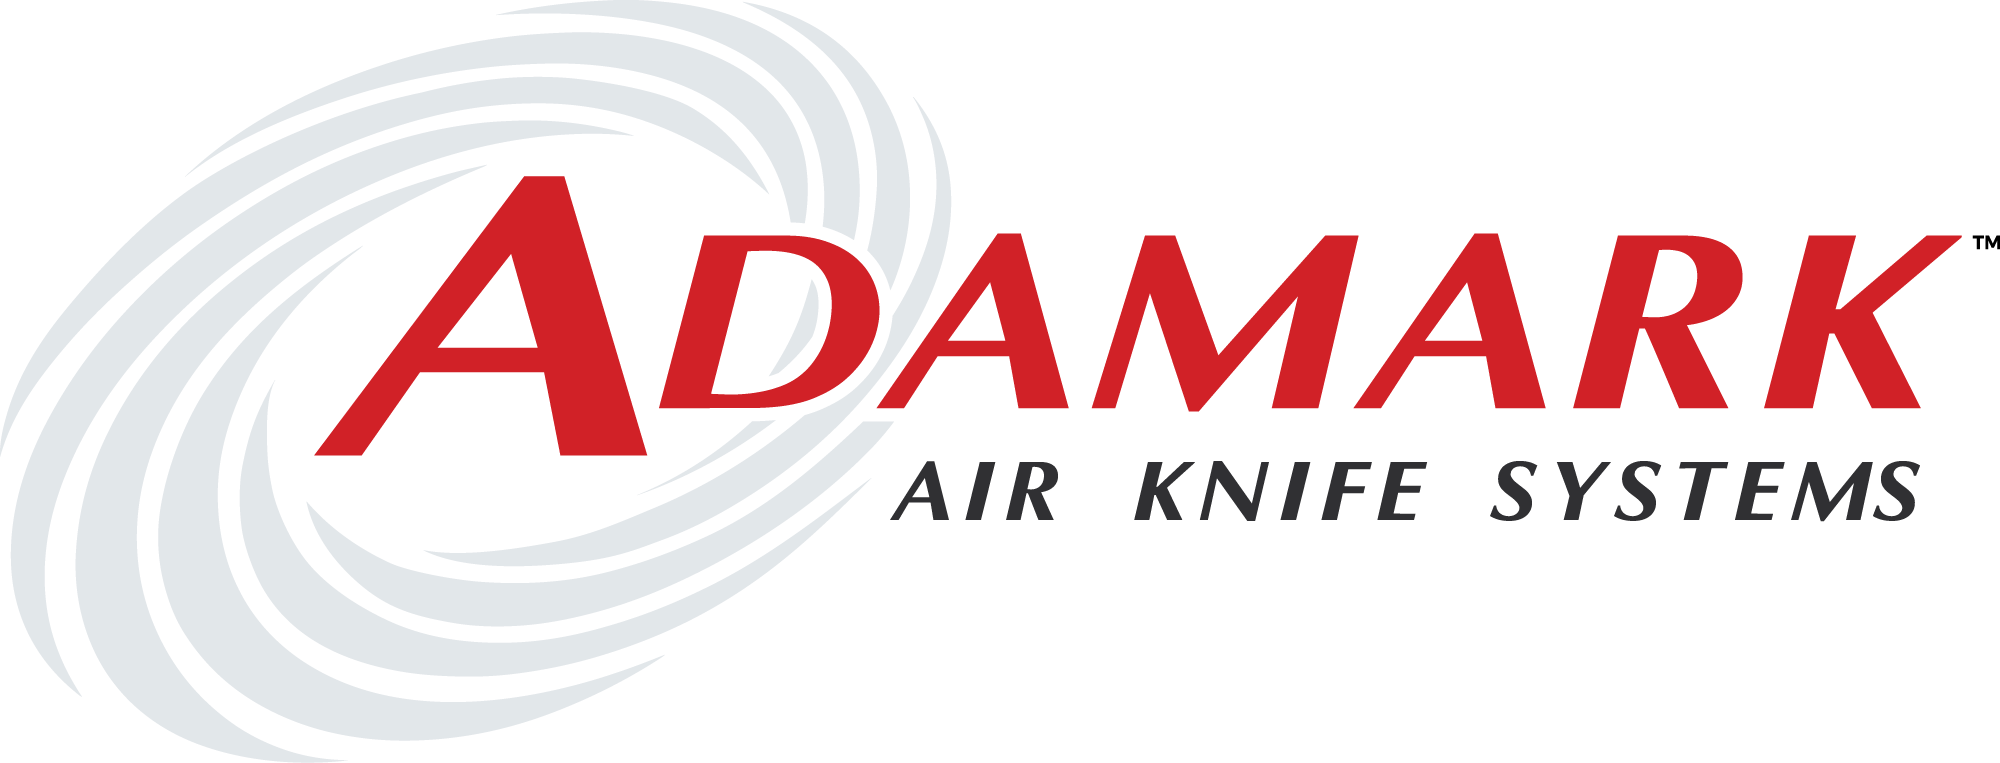 A logo for Adamark Air Knife Drying